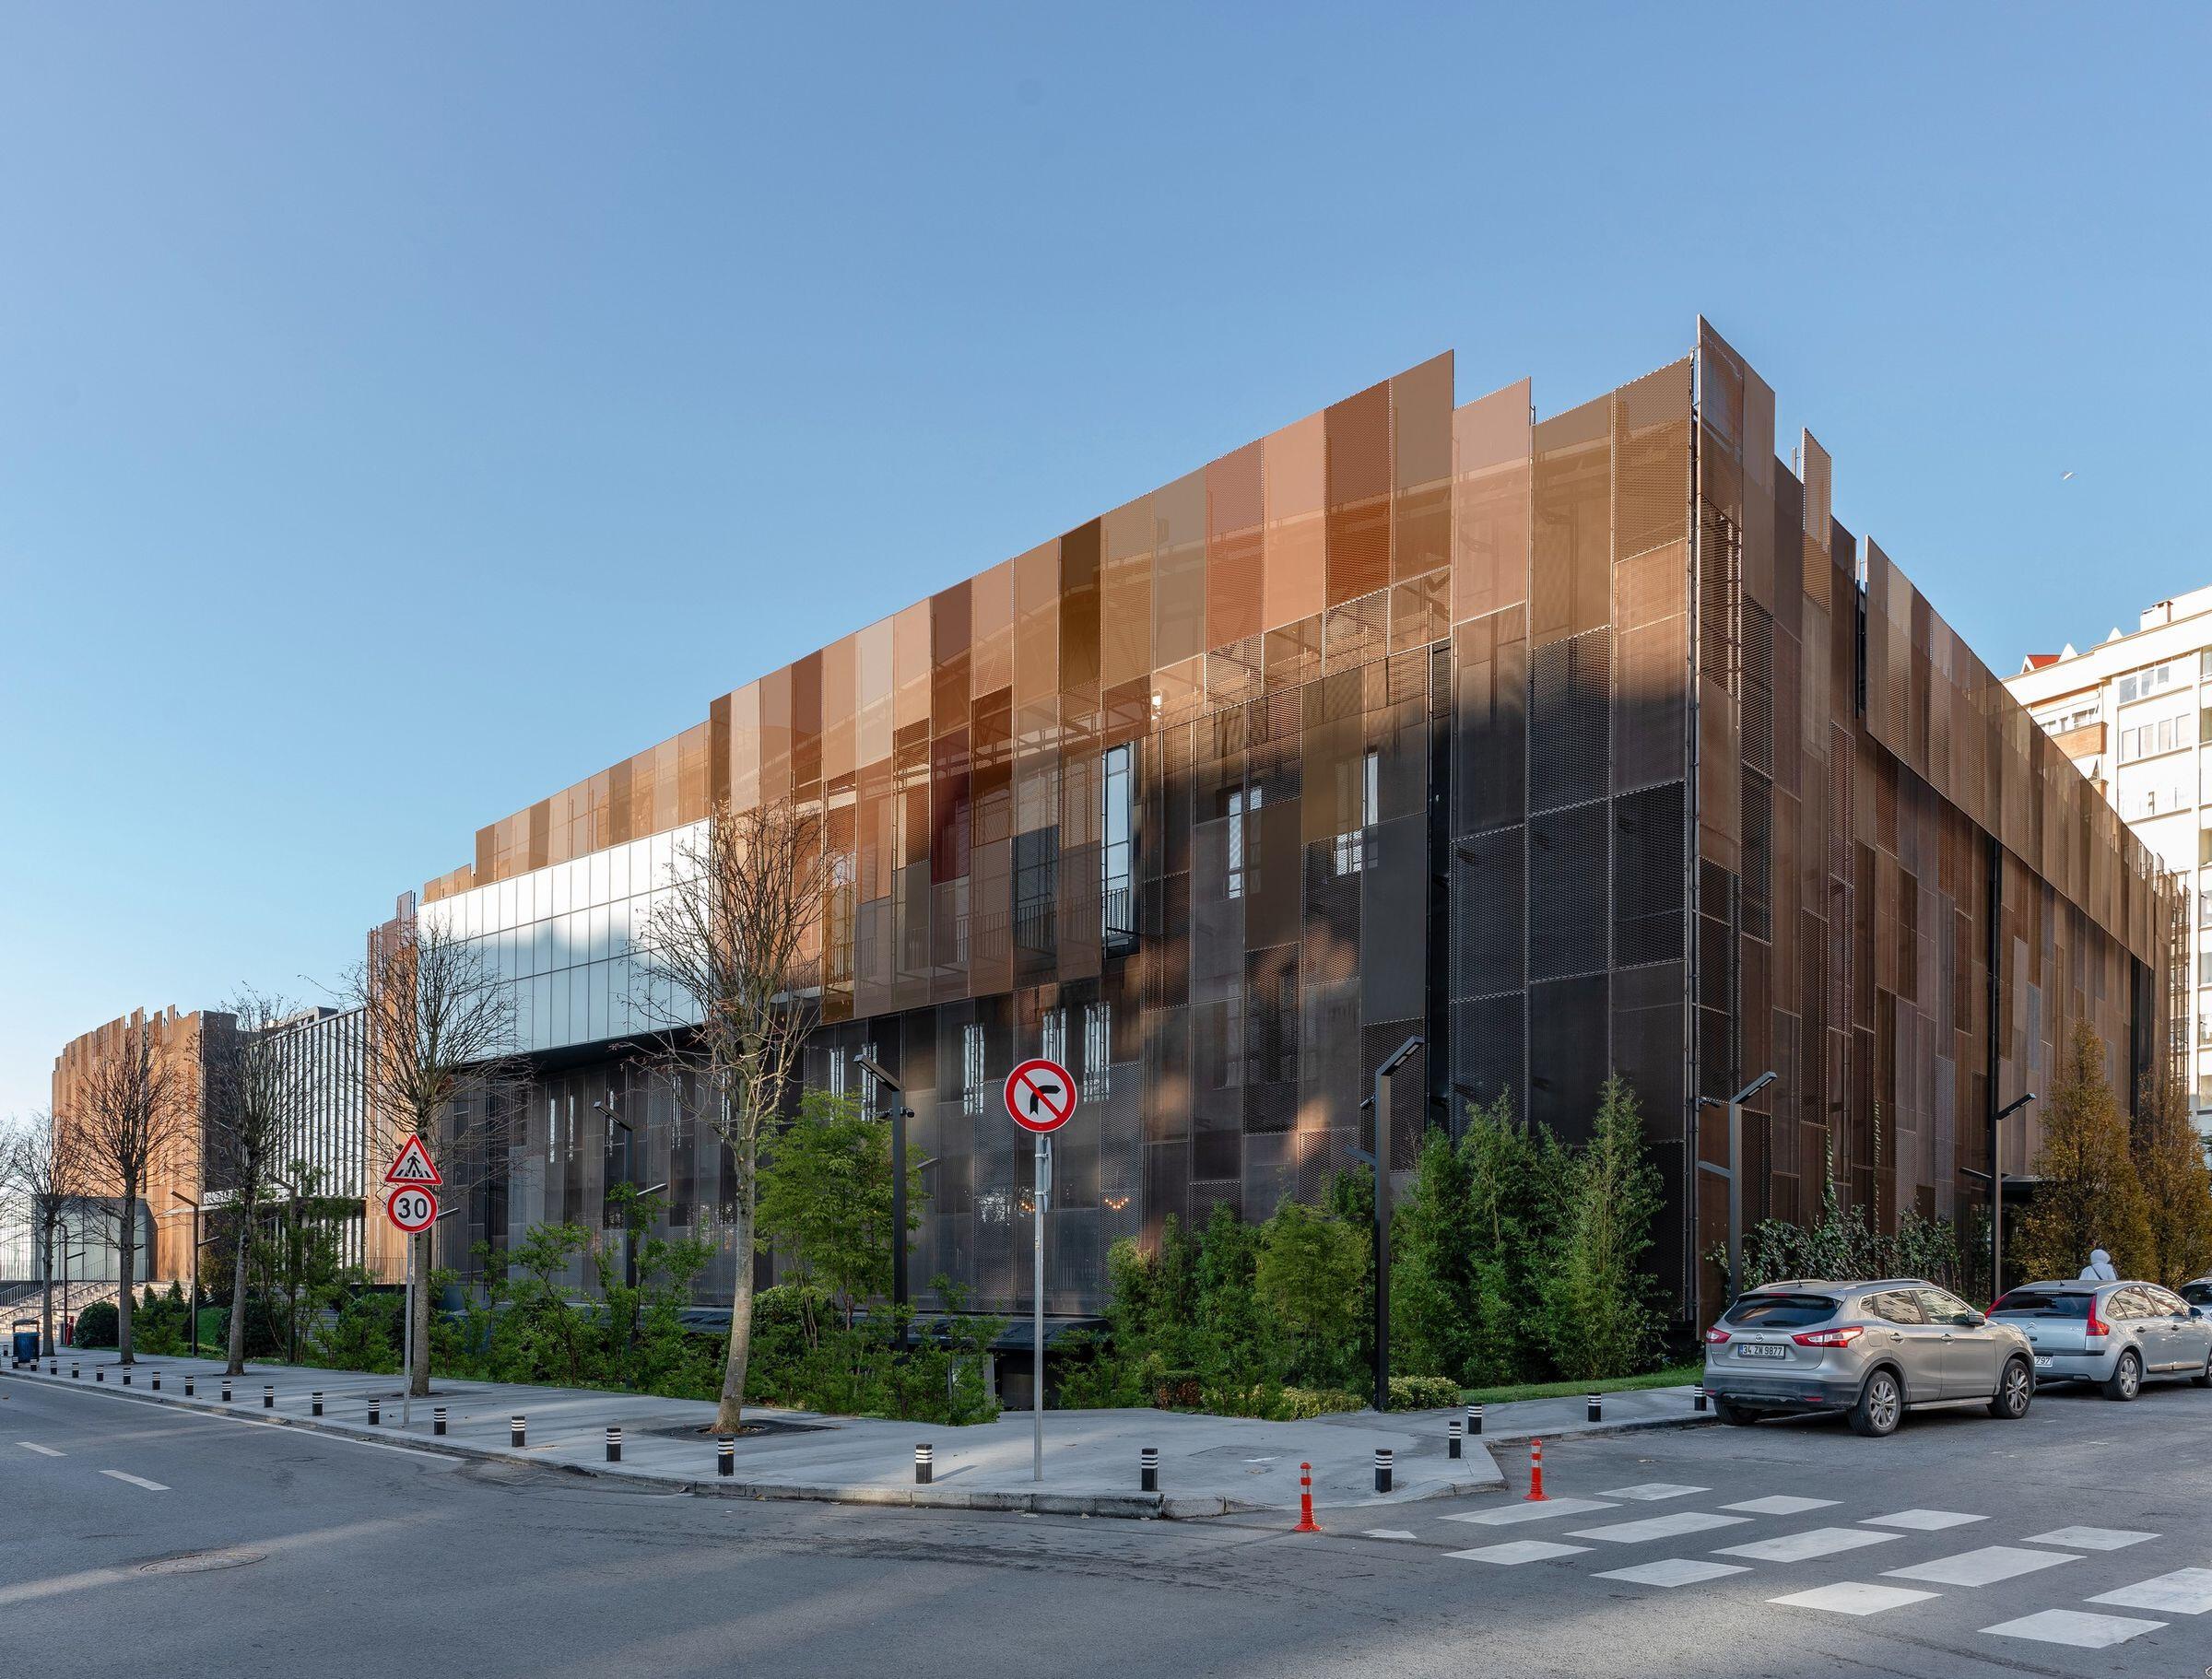 Beylikdüzü Arts and Cultural Center